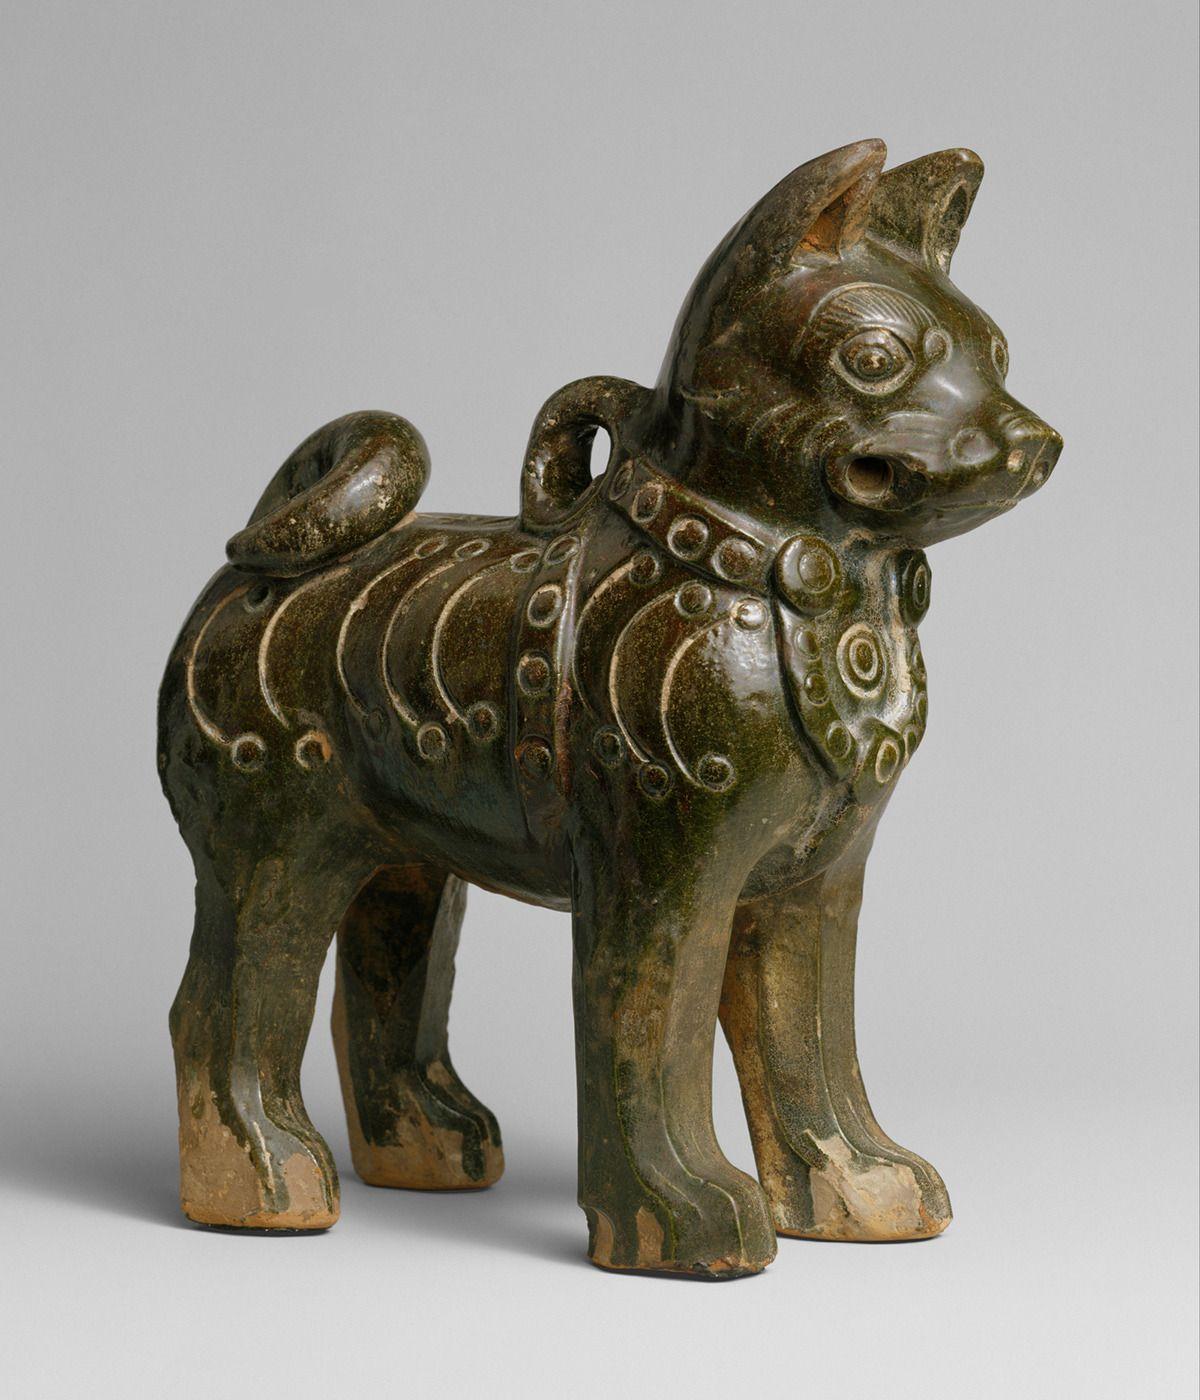 Ceramic dog with collar. China, Eastern Han Dynasty, 1st